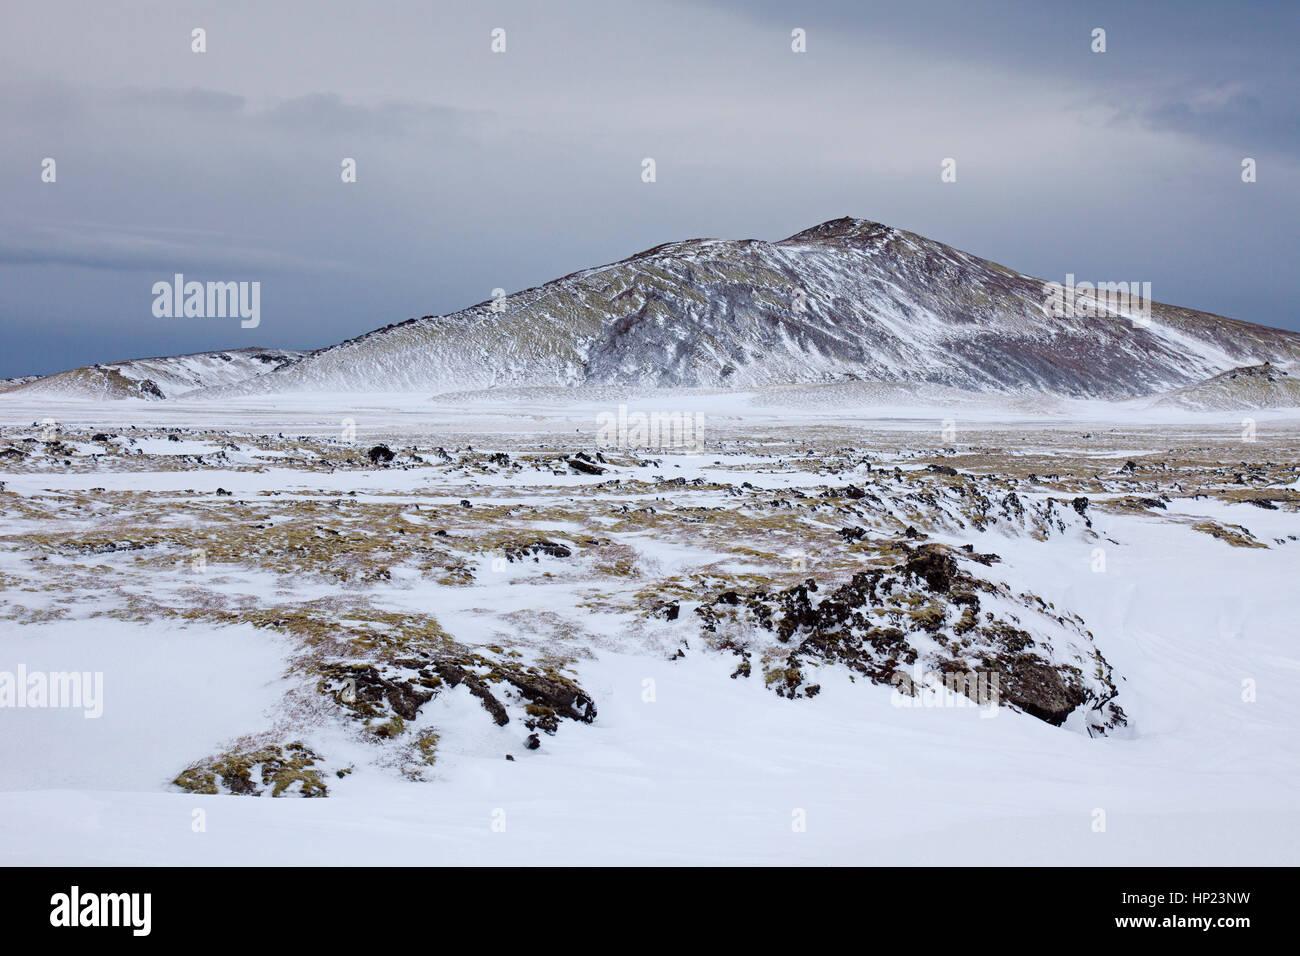 Stratovolcano Snaefellsjoekull and lava field covered in snow at the Snæfellsjökull National Park in winter - Stock Image